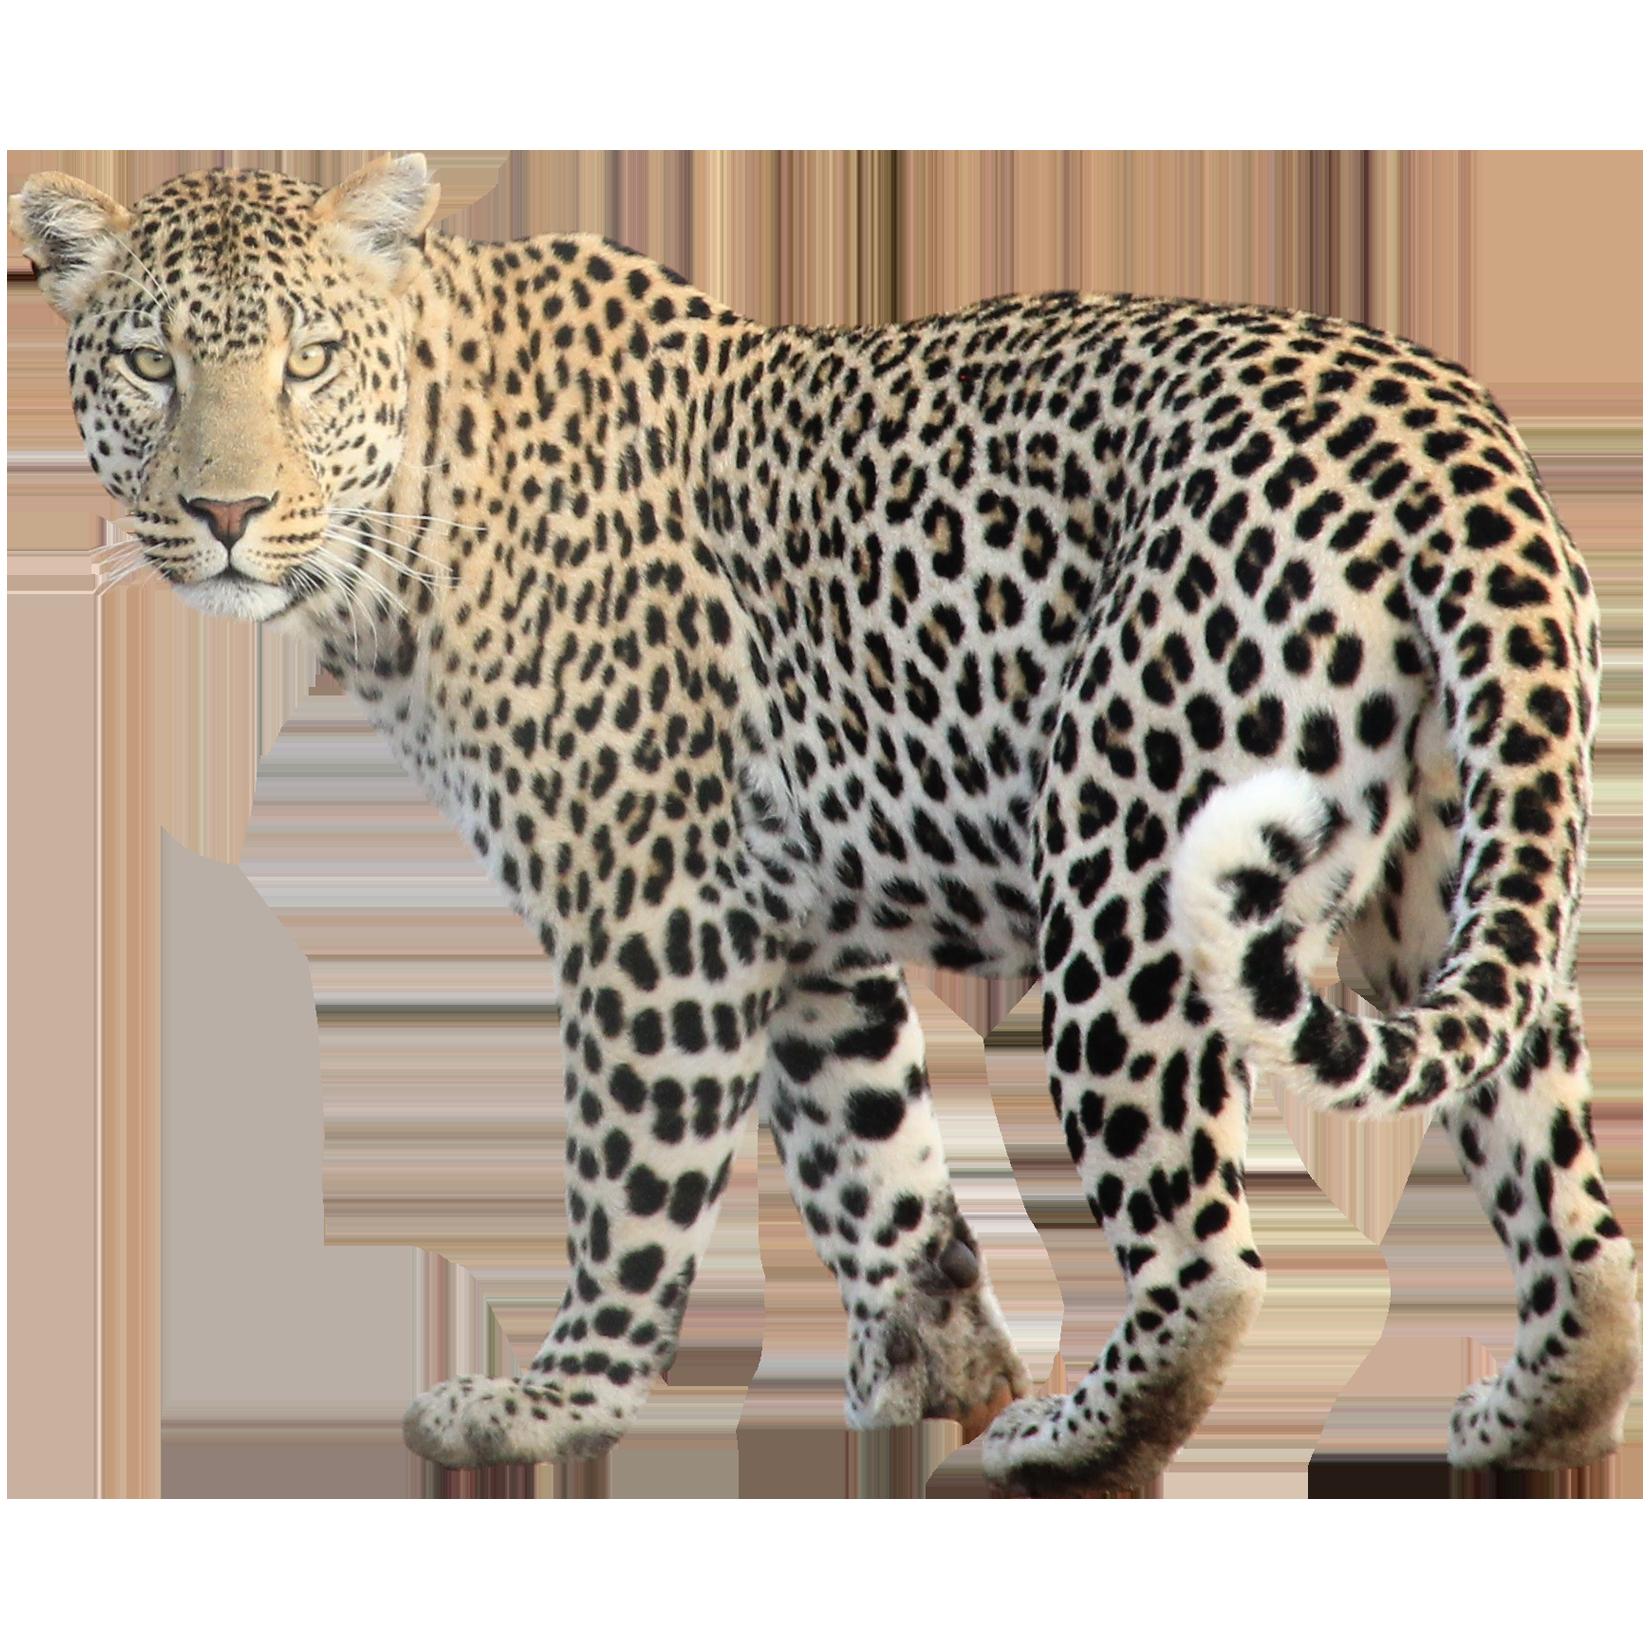 Big Cat Png - Leopard Big Cat Png 210X210   Leopard Png Transparent Free Images, Transparent background PNG HD thumbnail